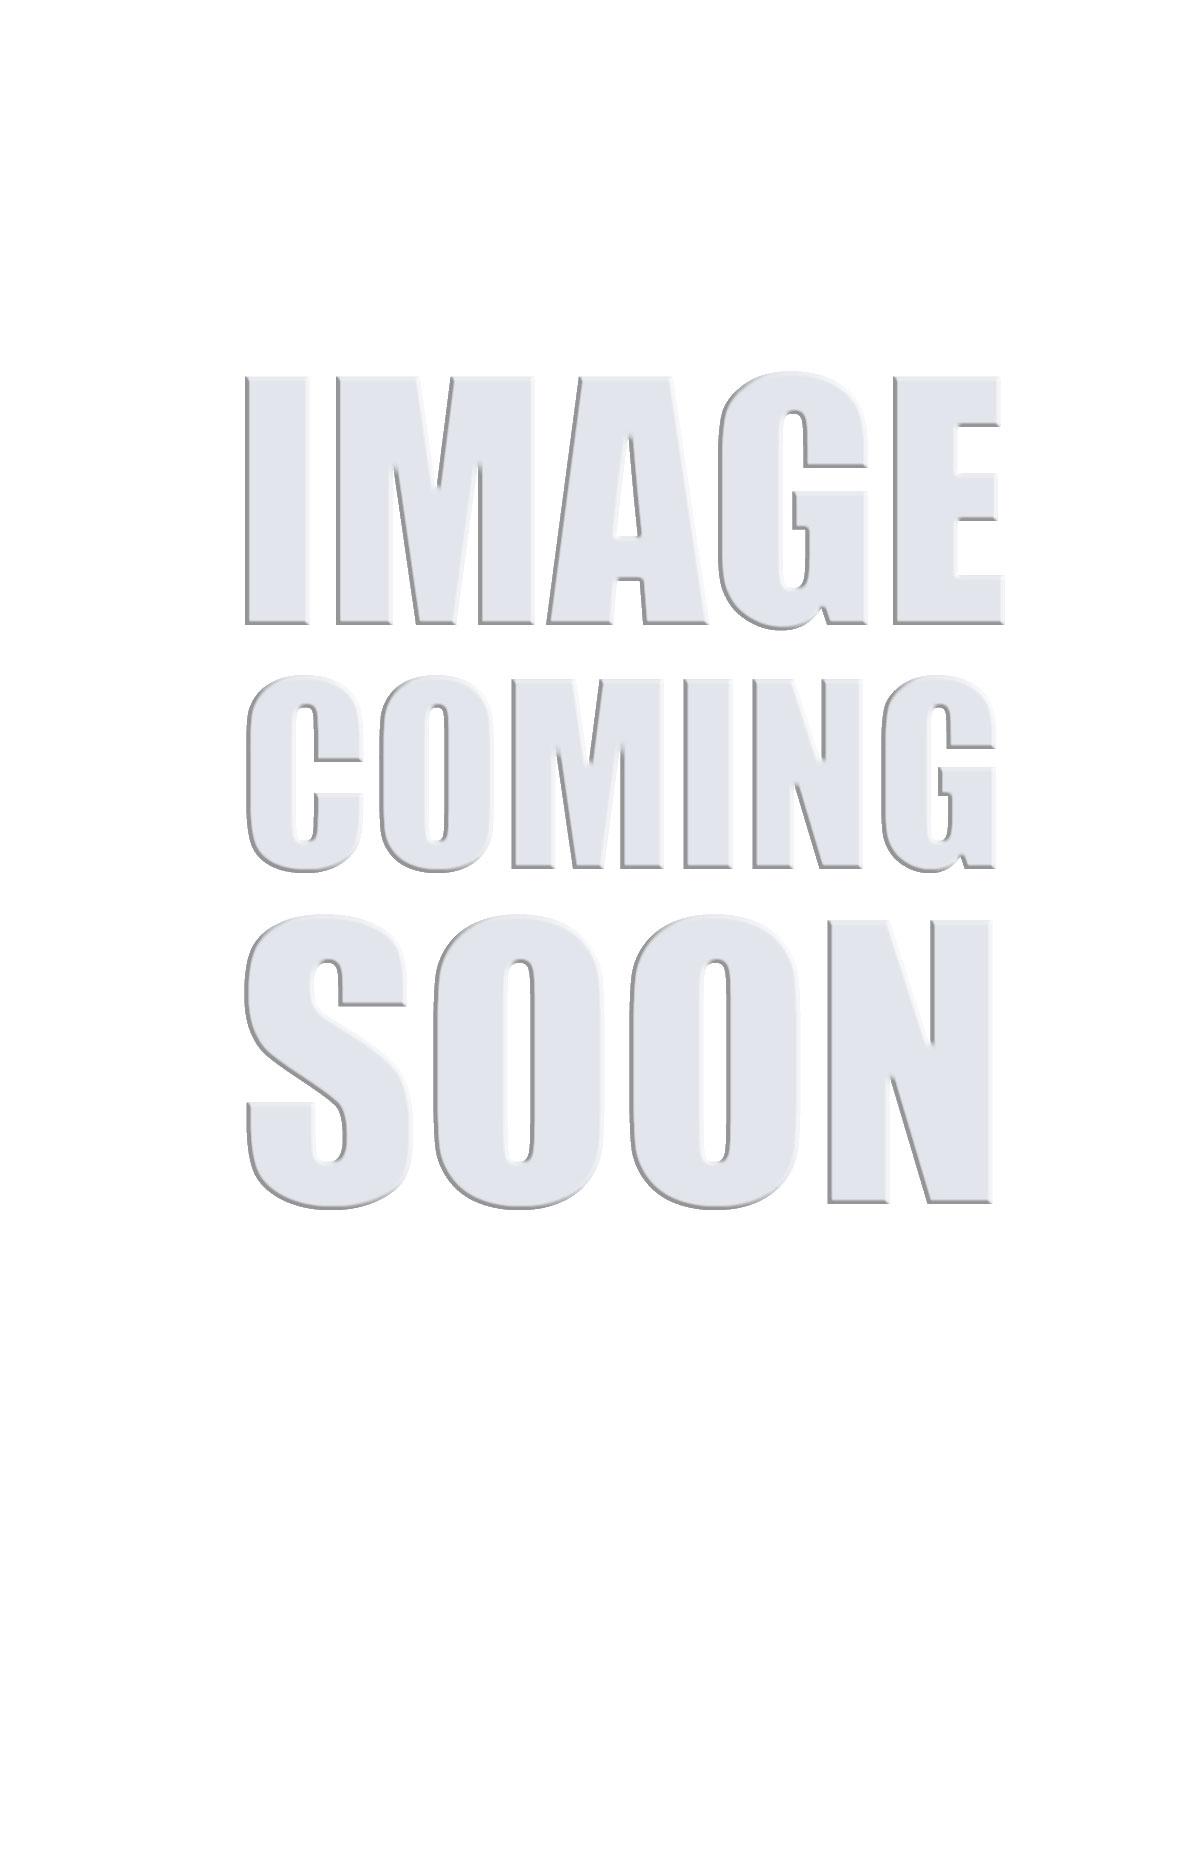 Tangential Discharge Vacuum Motor - Lamb #116103-00, BPT, HD, B/B, A/S, 3 STG